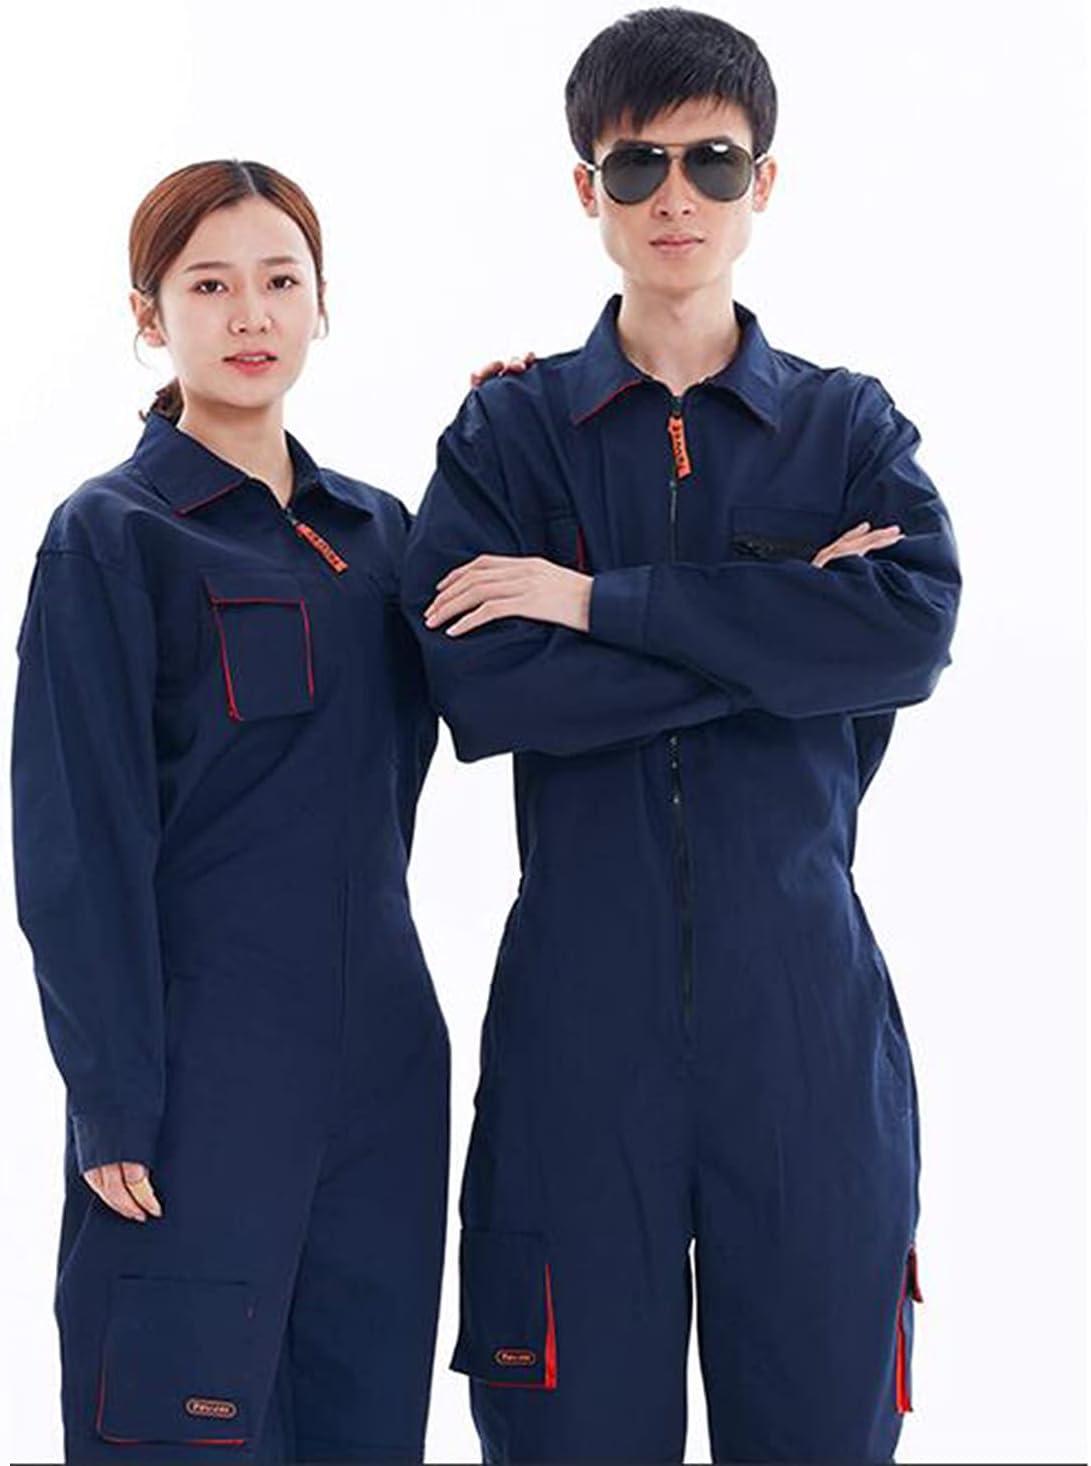 Work Overalls Gifts Uniforms Men Women It is very popular Wo Repair Coveralls Car Working